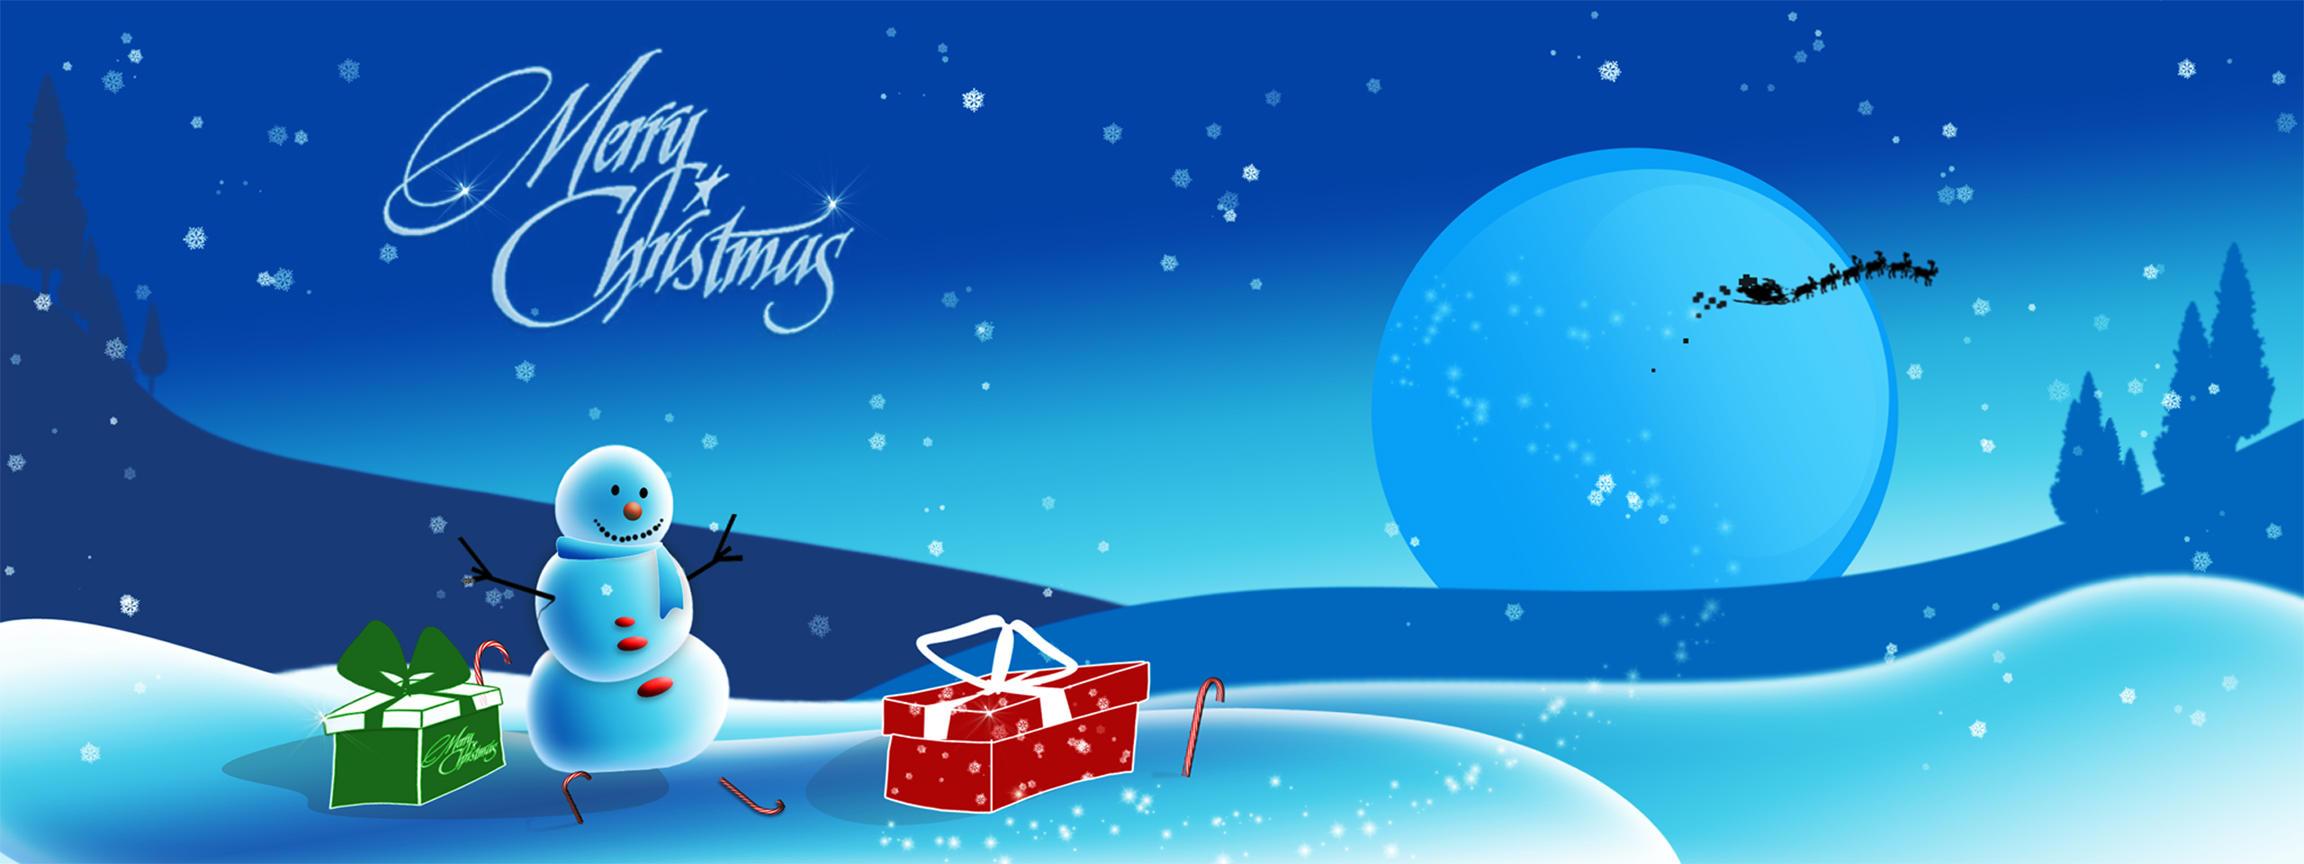 Free Hd Christmas Wallpapers Desktop Backgrounds 2016